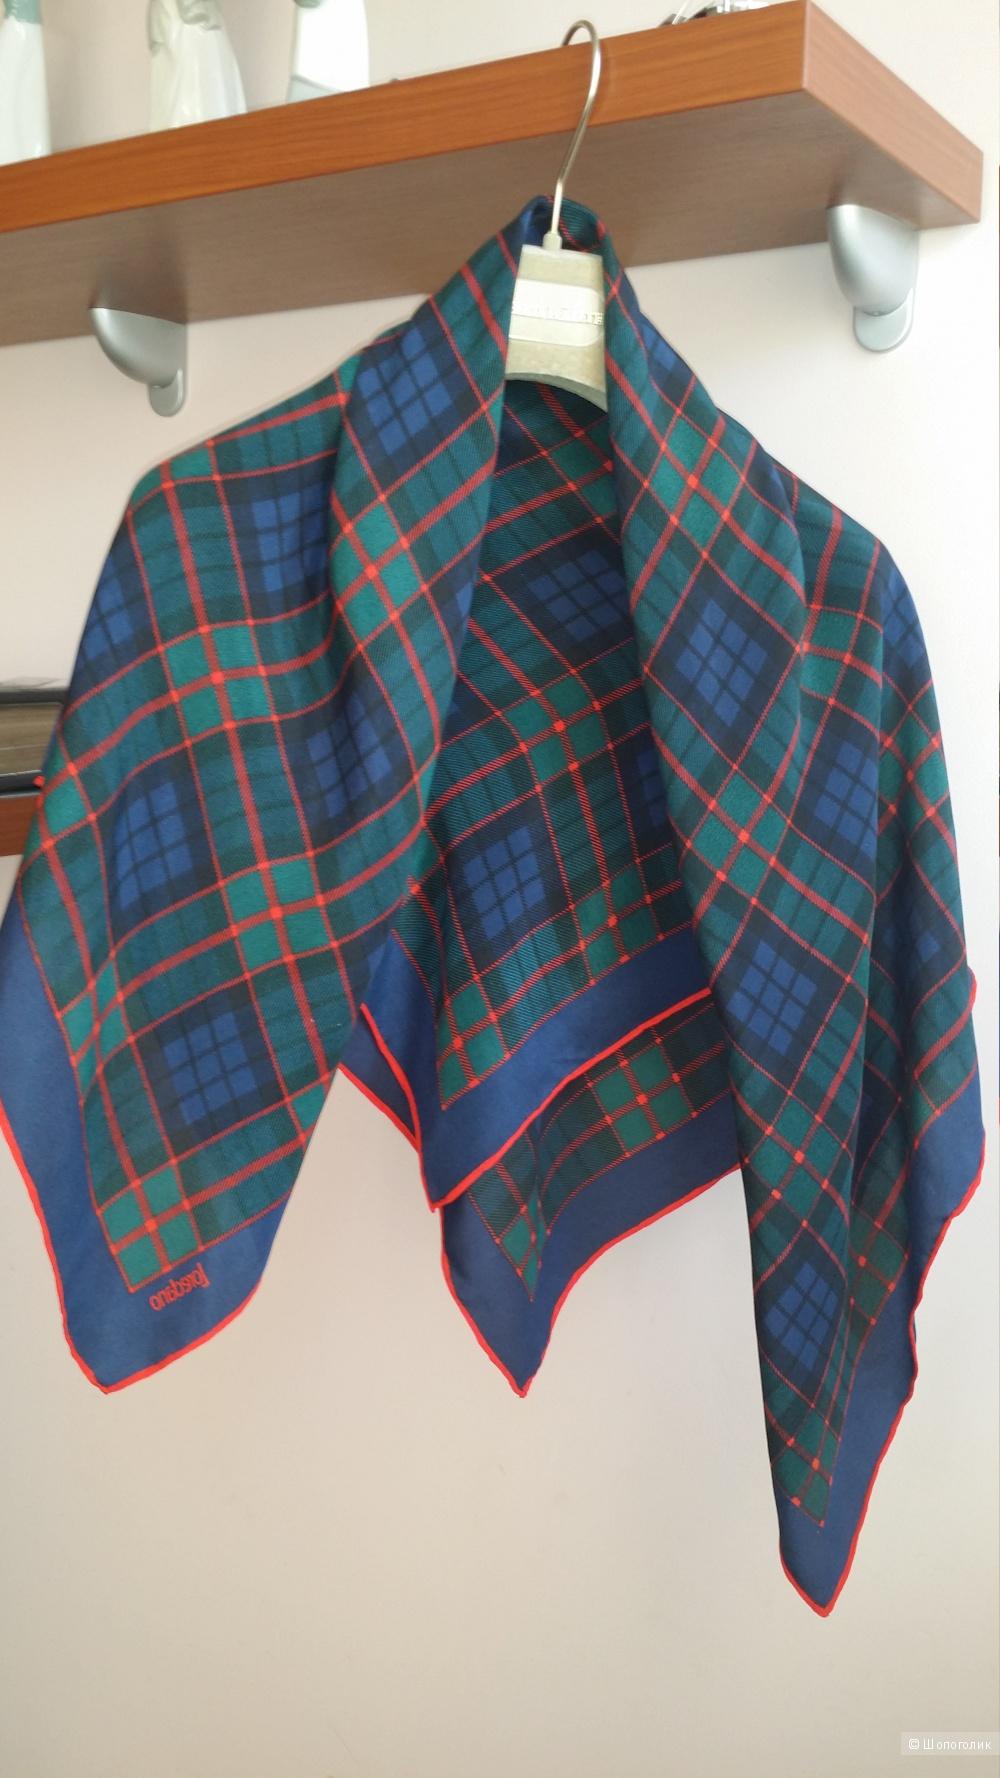 Шелковый платок  Loredano . 89 см на 89 см